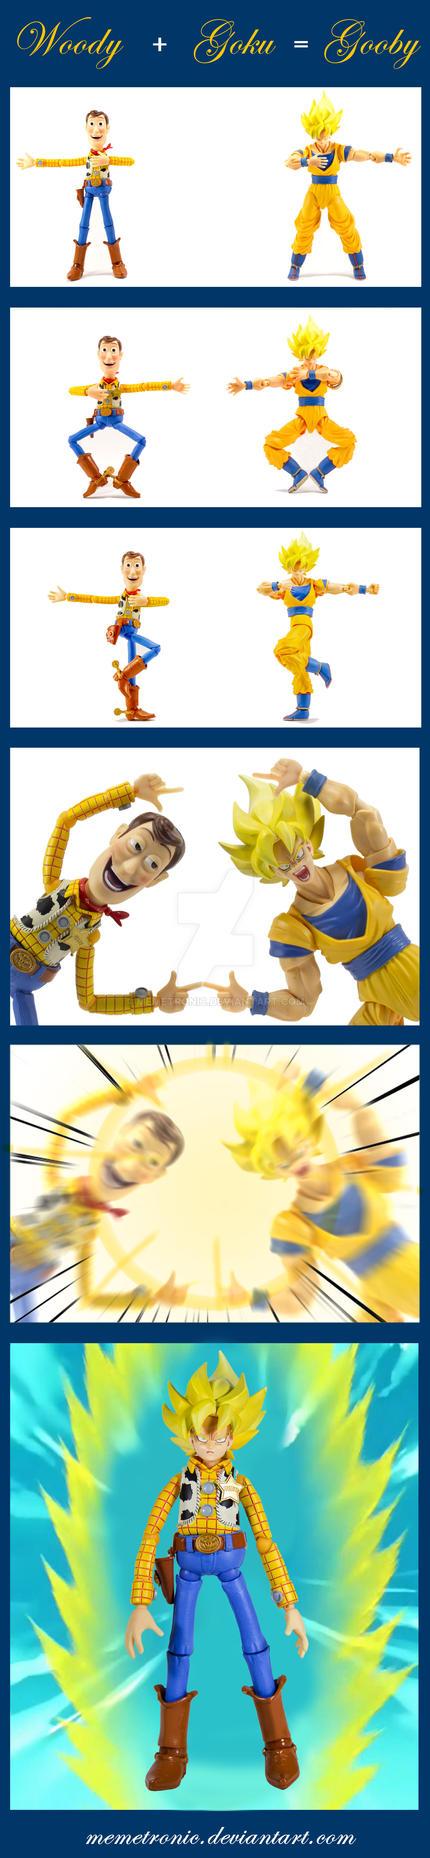 Fusion: Woody + Goku = Gooby by memetronic